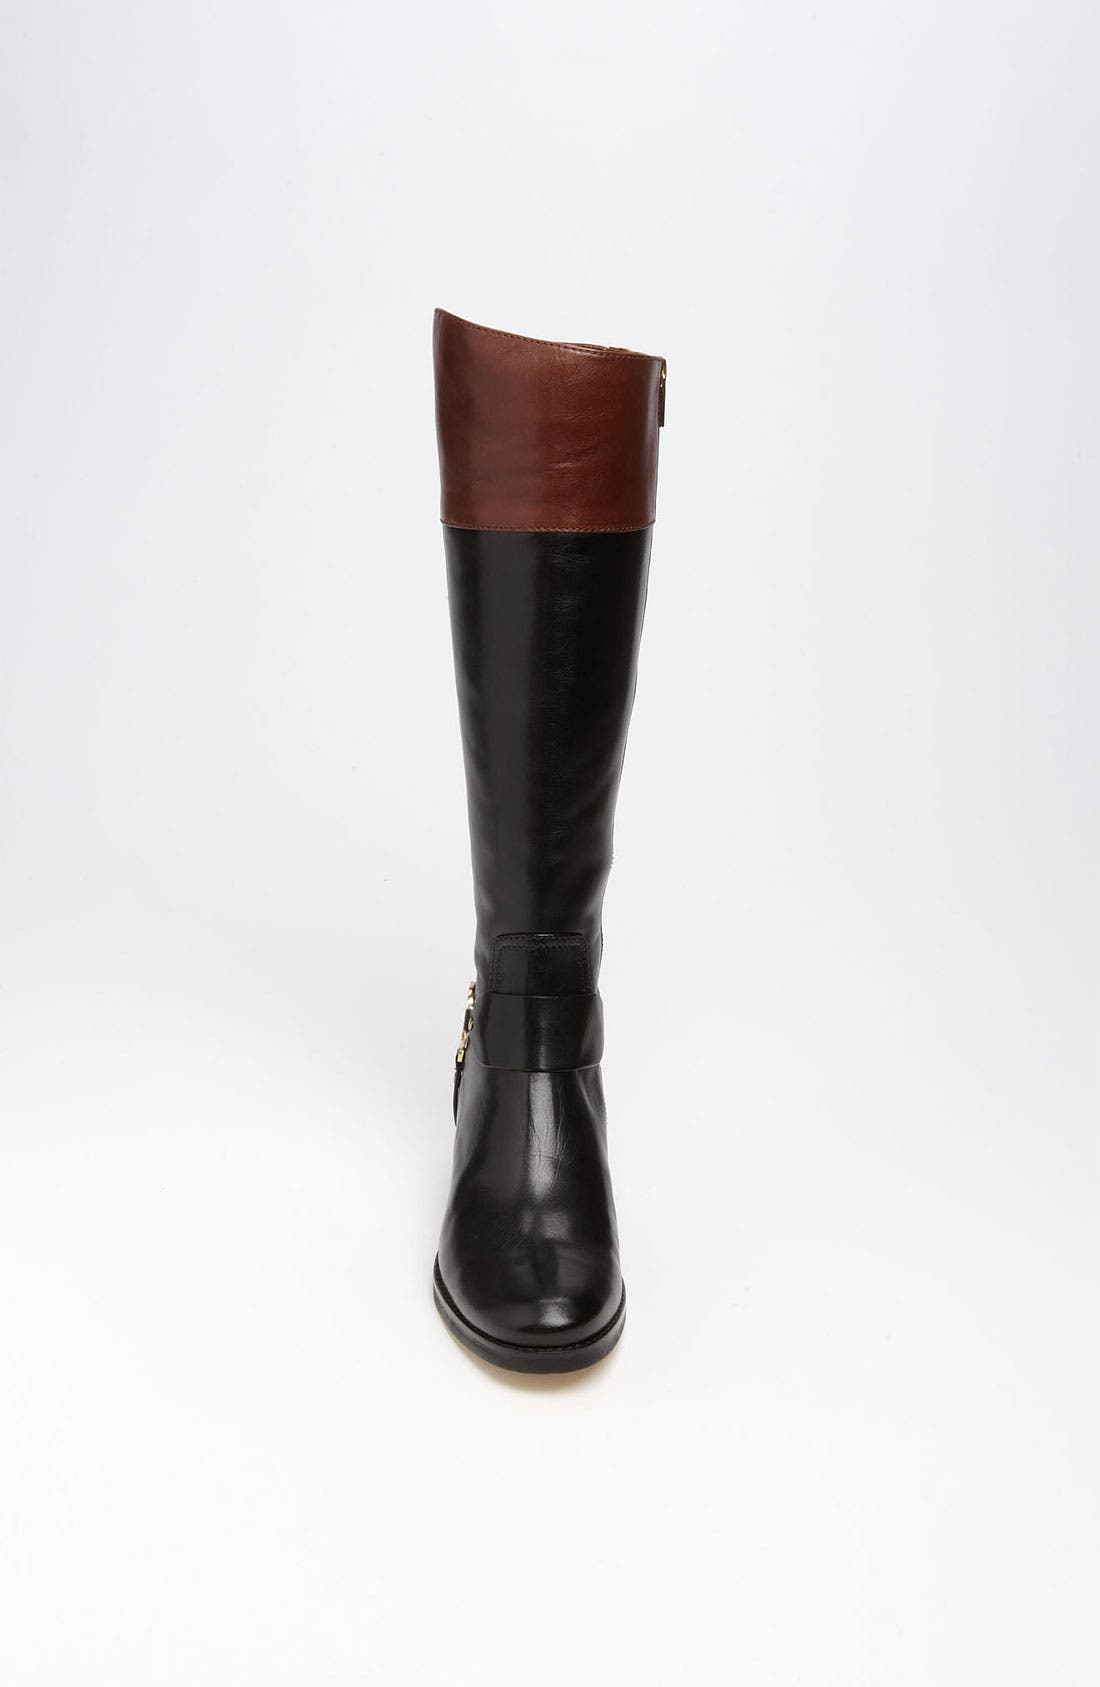 MICHAEL MICHAEL KORS,                             'Fulton' Harness Boot,                             Alternate thumbnail 2, color,                             014